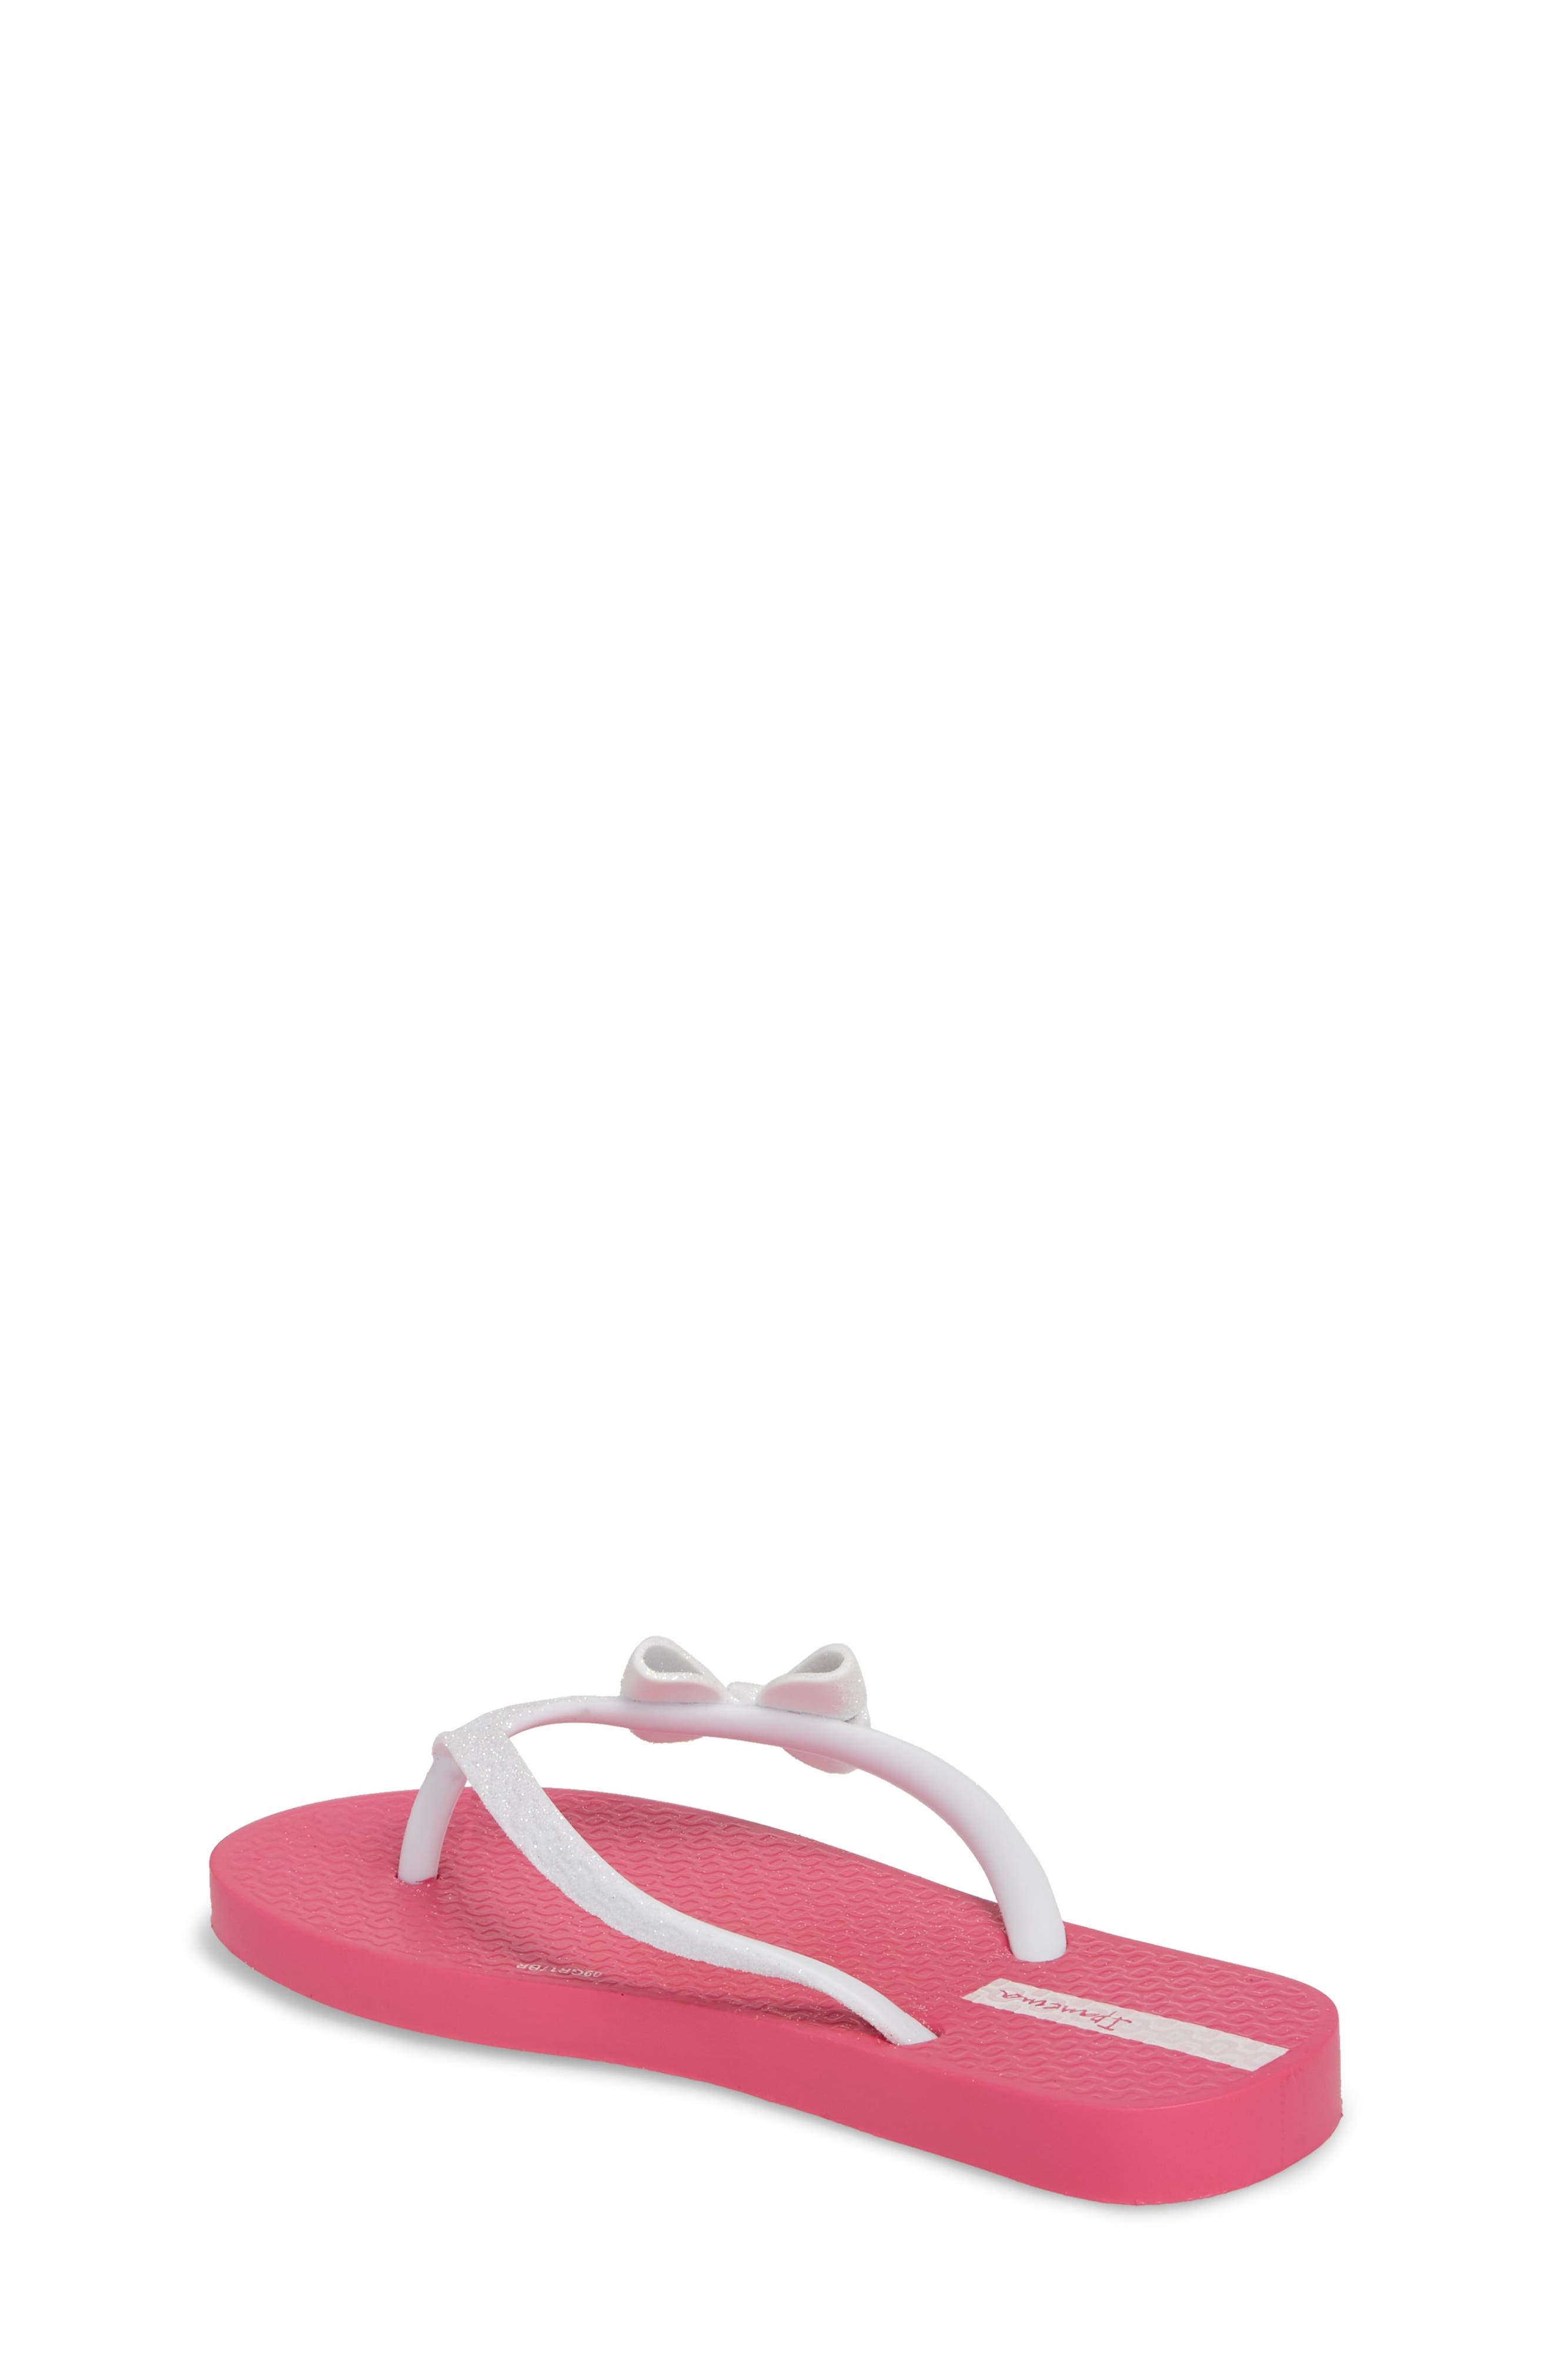 IPANEMA, Glitter IV Flip Flop, Alternate thumbnail 2, color, PINK/ WHITE